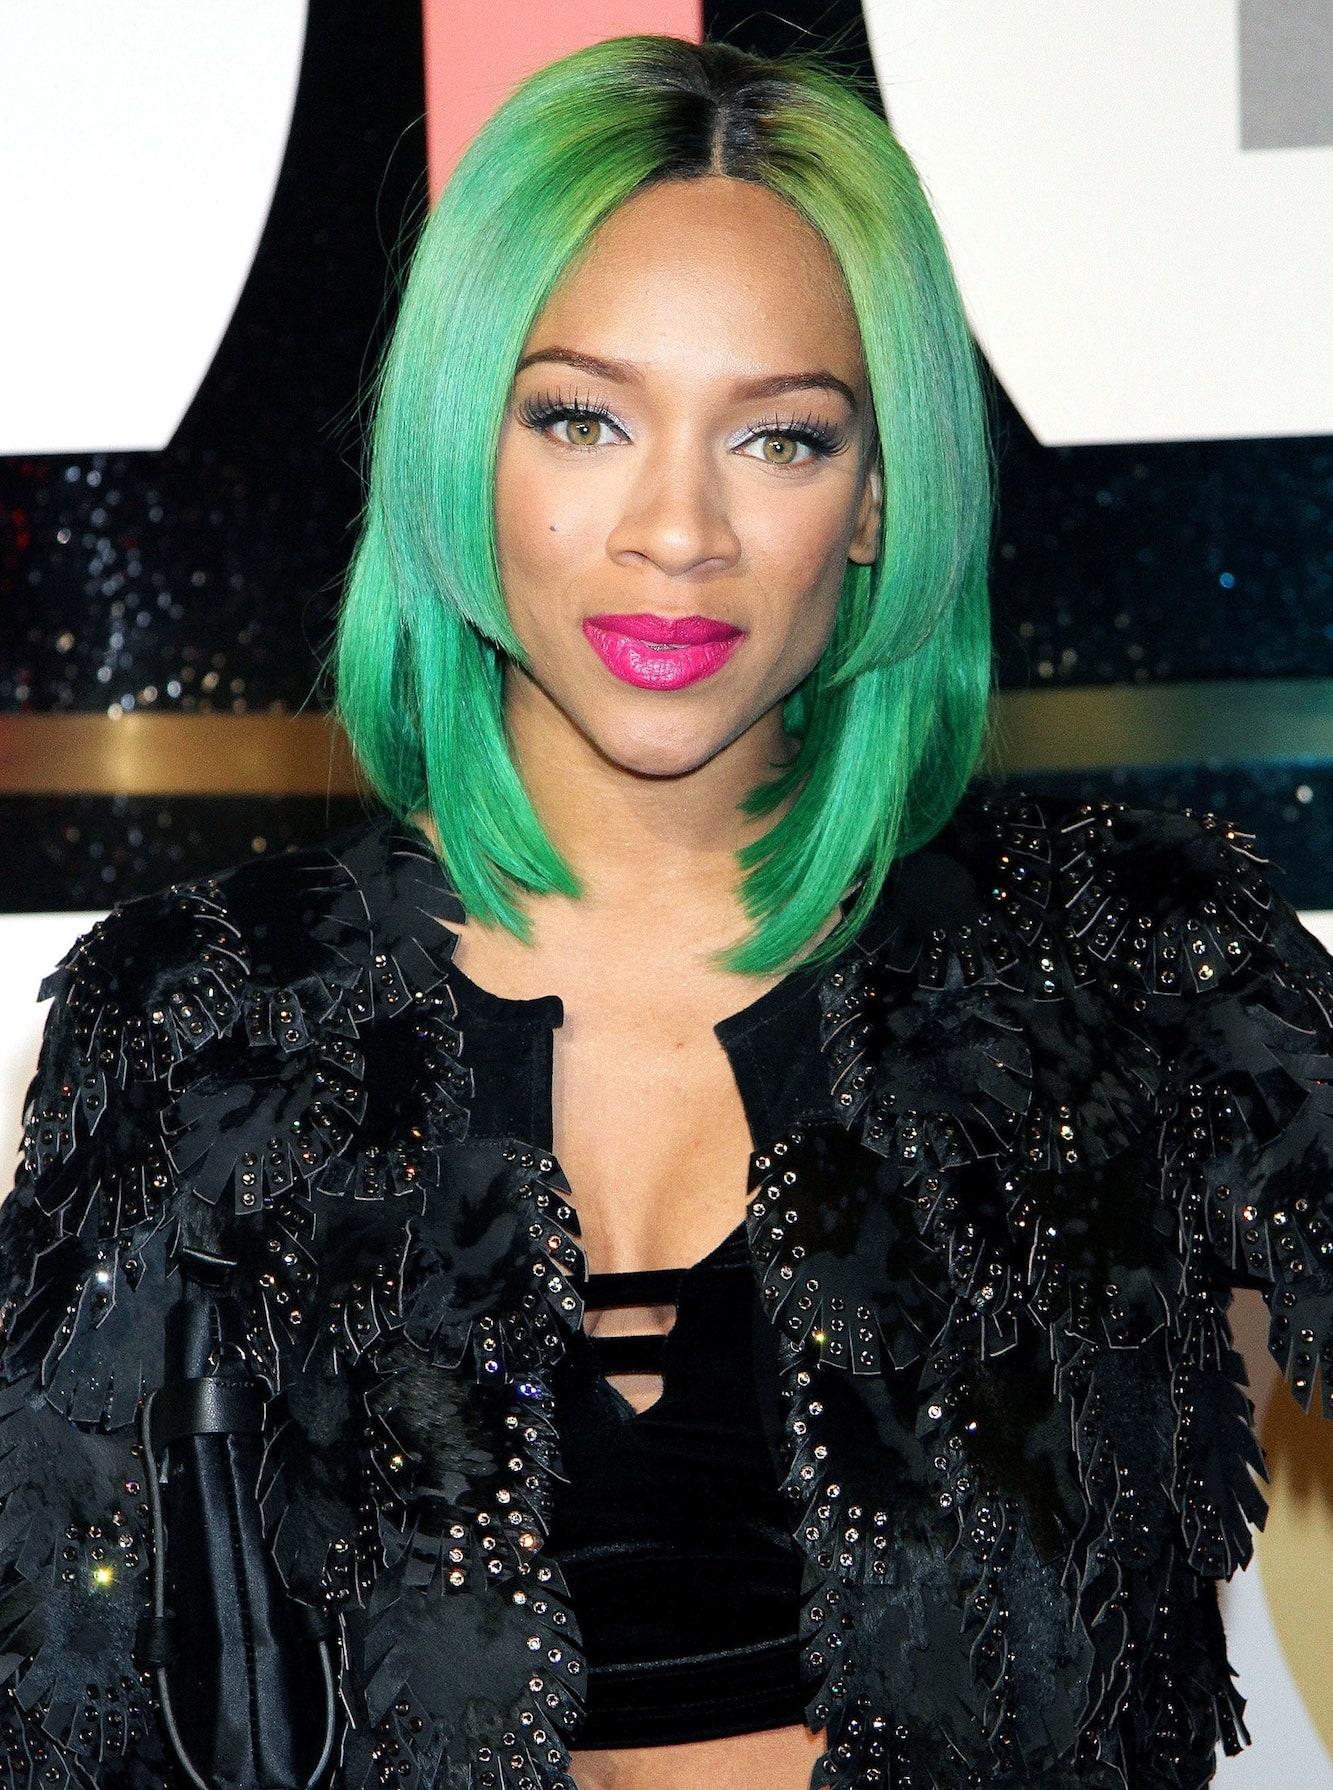 6 lil mama dengan warna rambut hijau